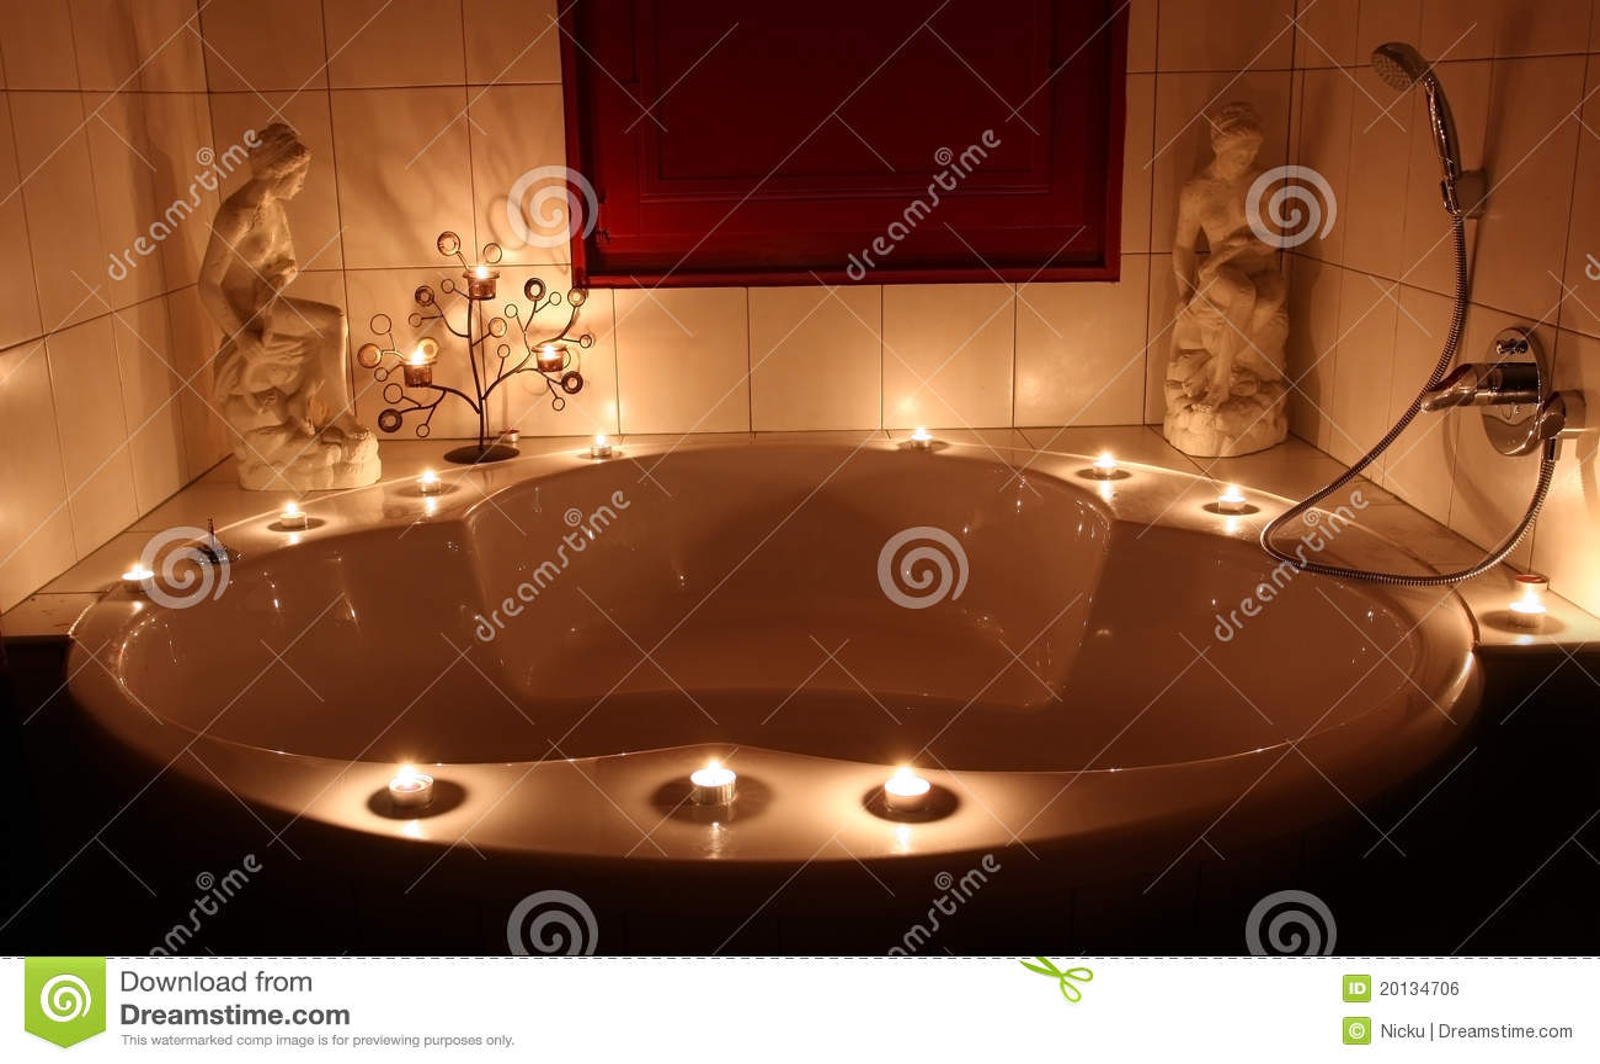 romantic bathtub stock photography 20134706. Black Bedroom Furniture Sets. Home Design Ideas